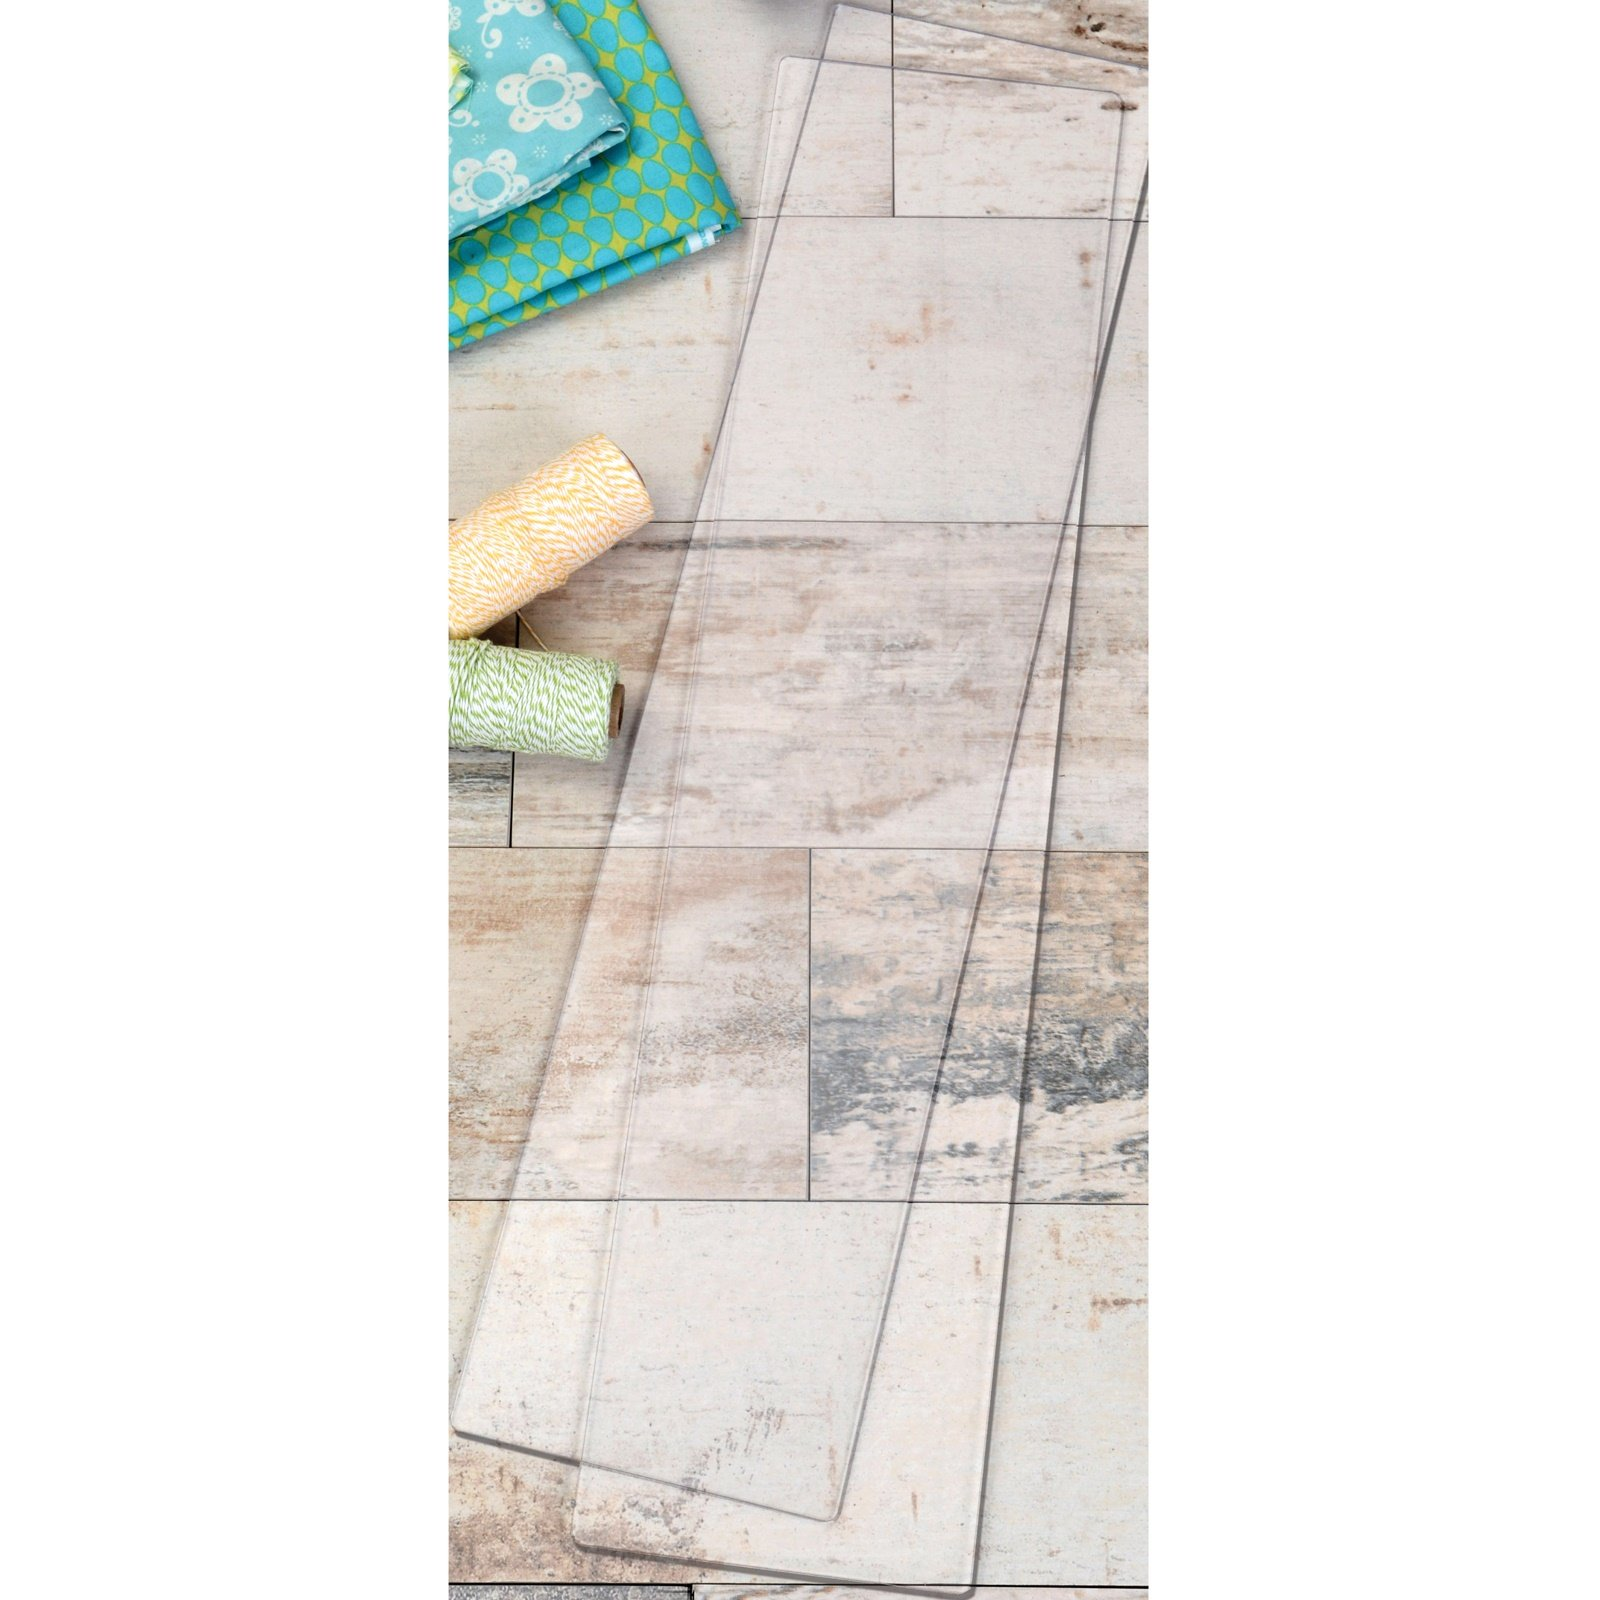 Sizzix 659811 Cutting Pads, 25-Inch